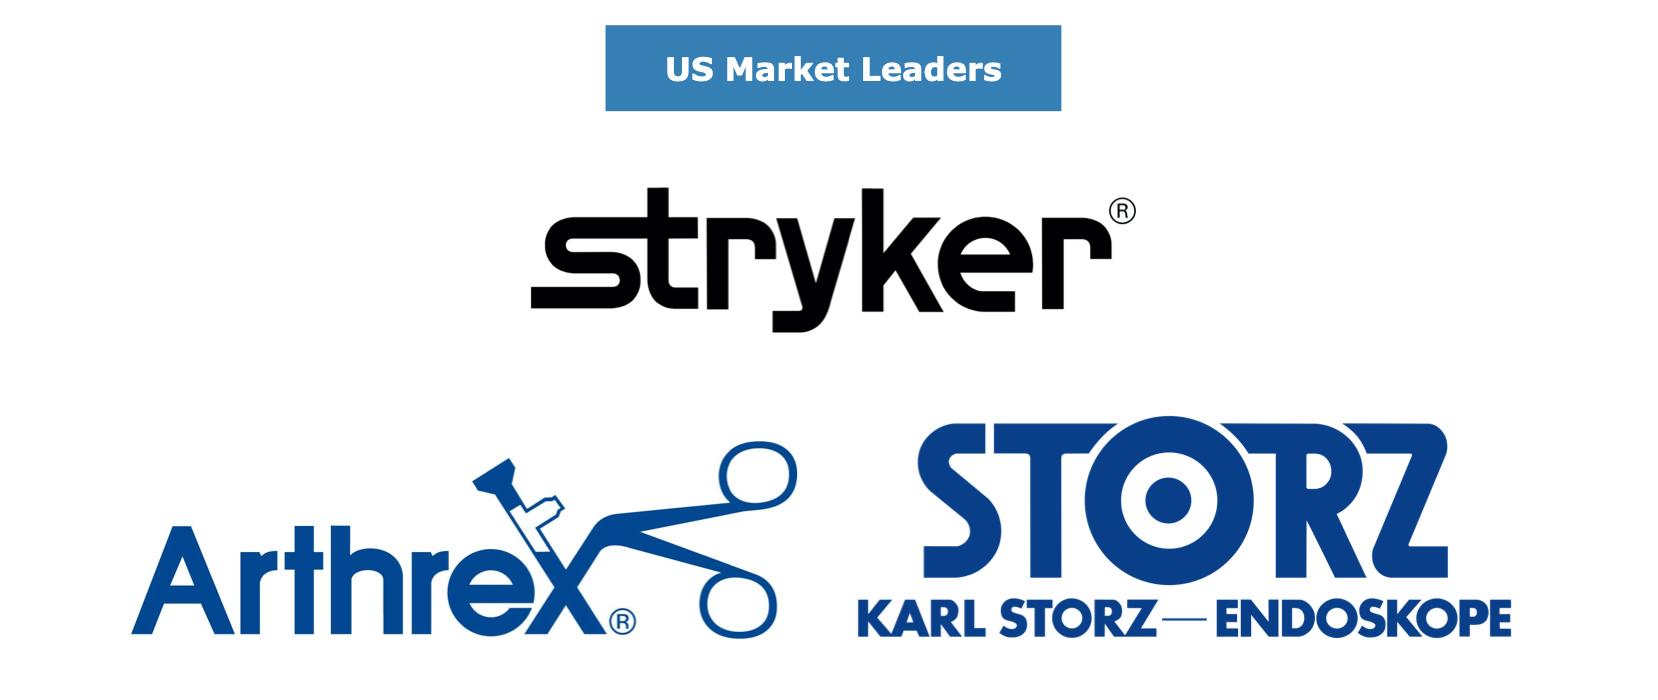 US Video Endoscopy Market Leaders